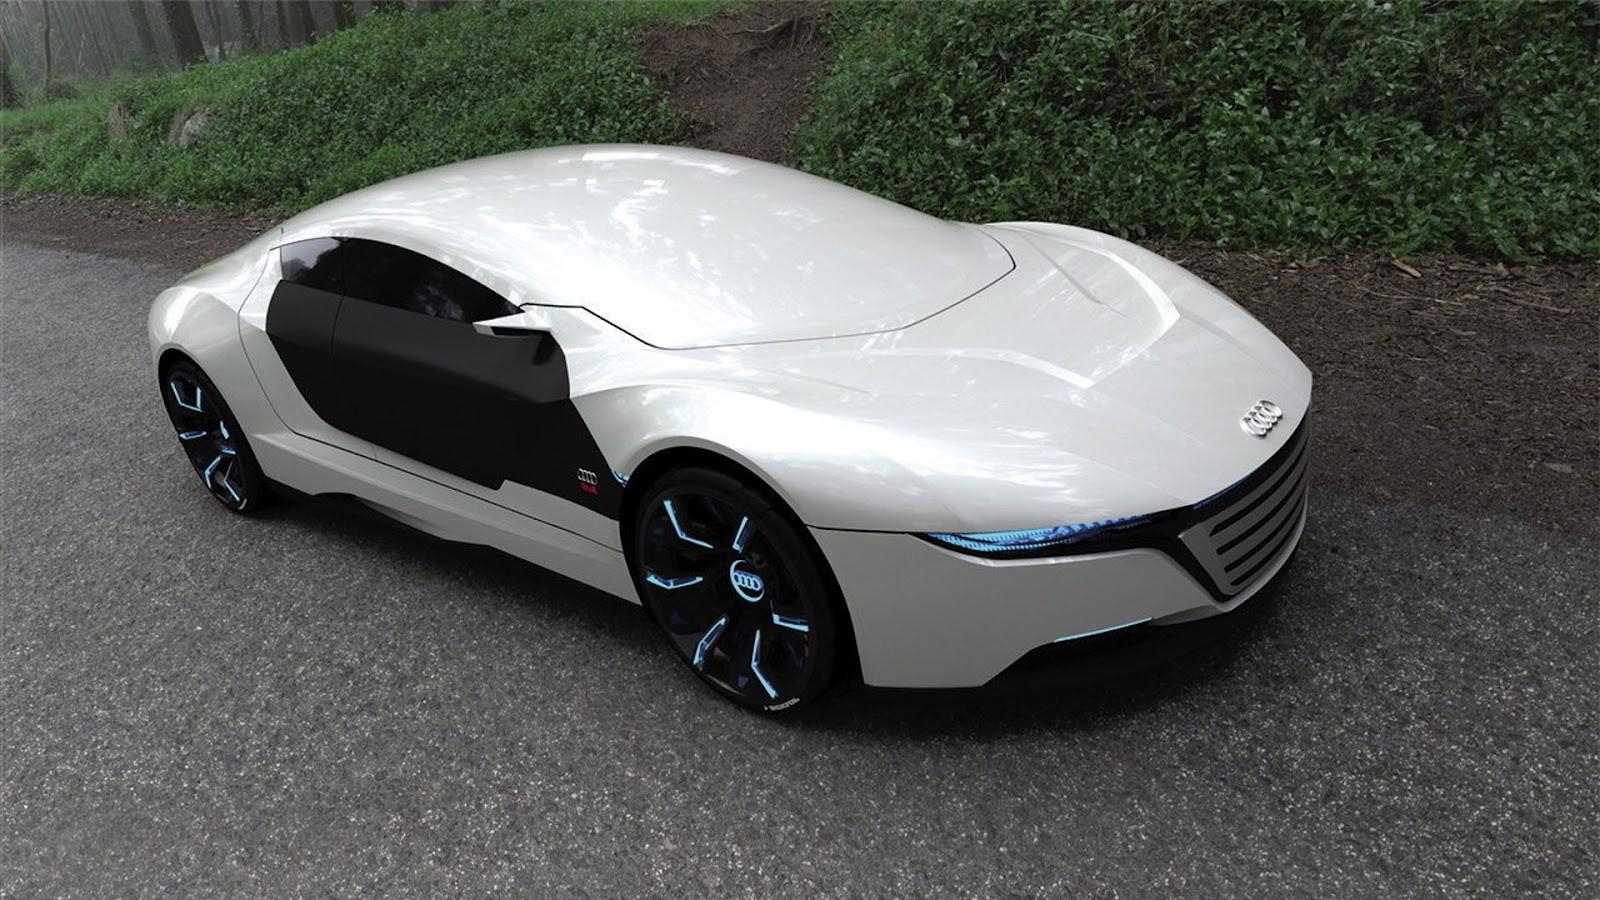 Audi A9 Concept Car >> Epic Car Wallpapers - WallpaperSafari